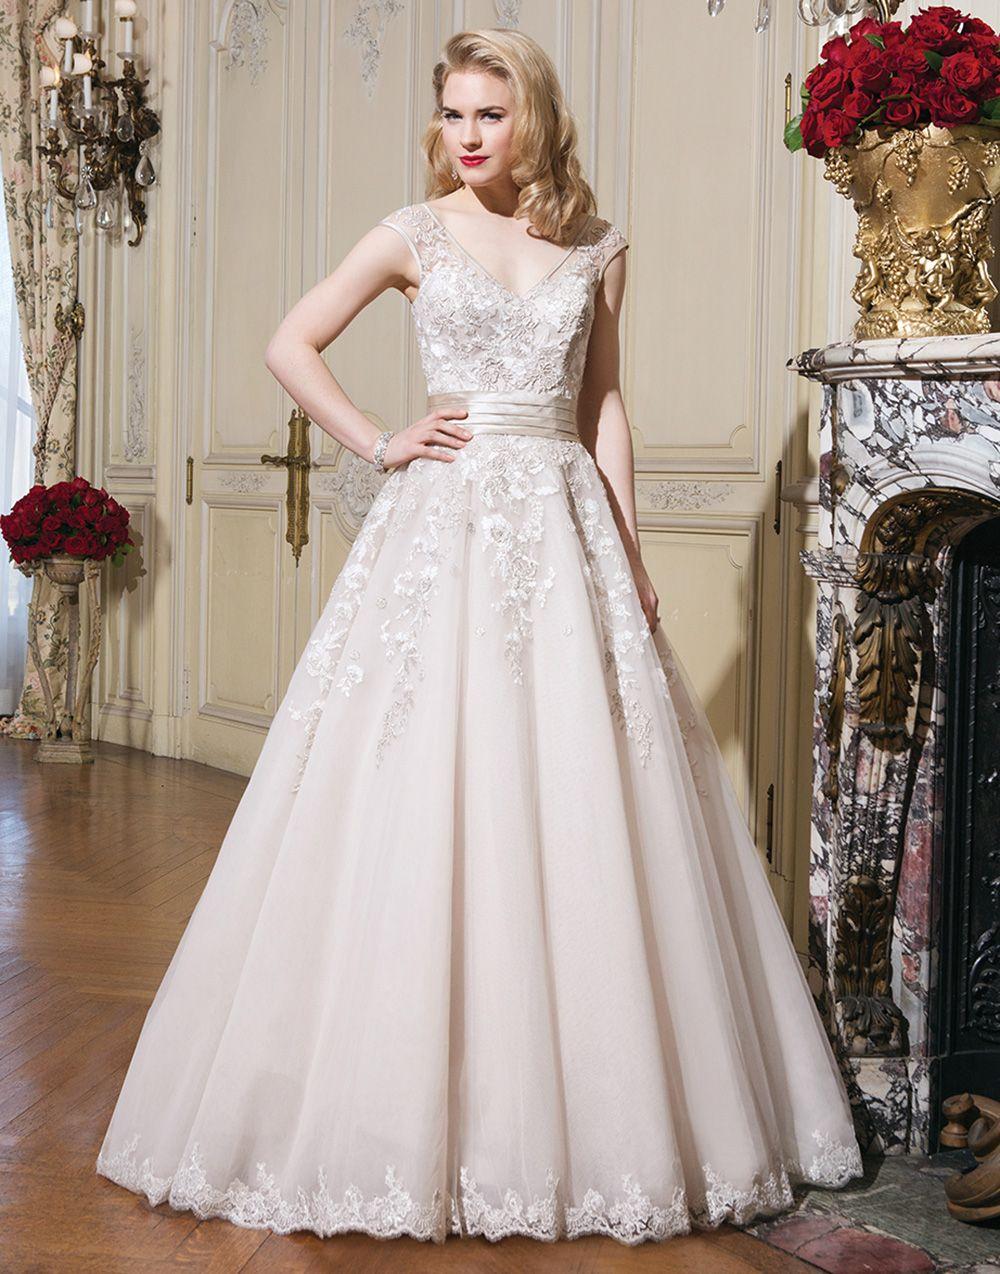 Justin Alexander wedding dresses style 8760 | Pinterest | Lace ball ...